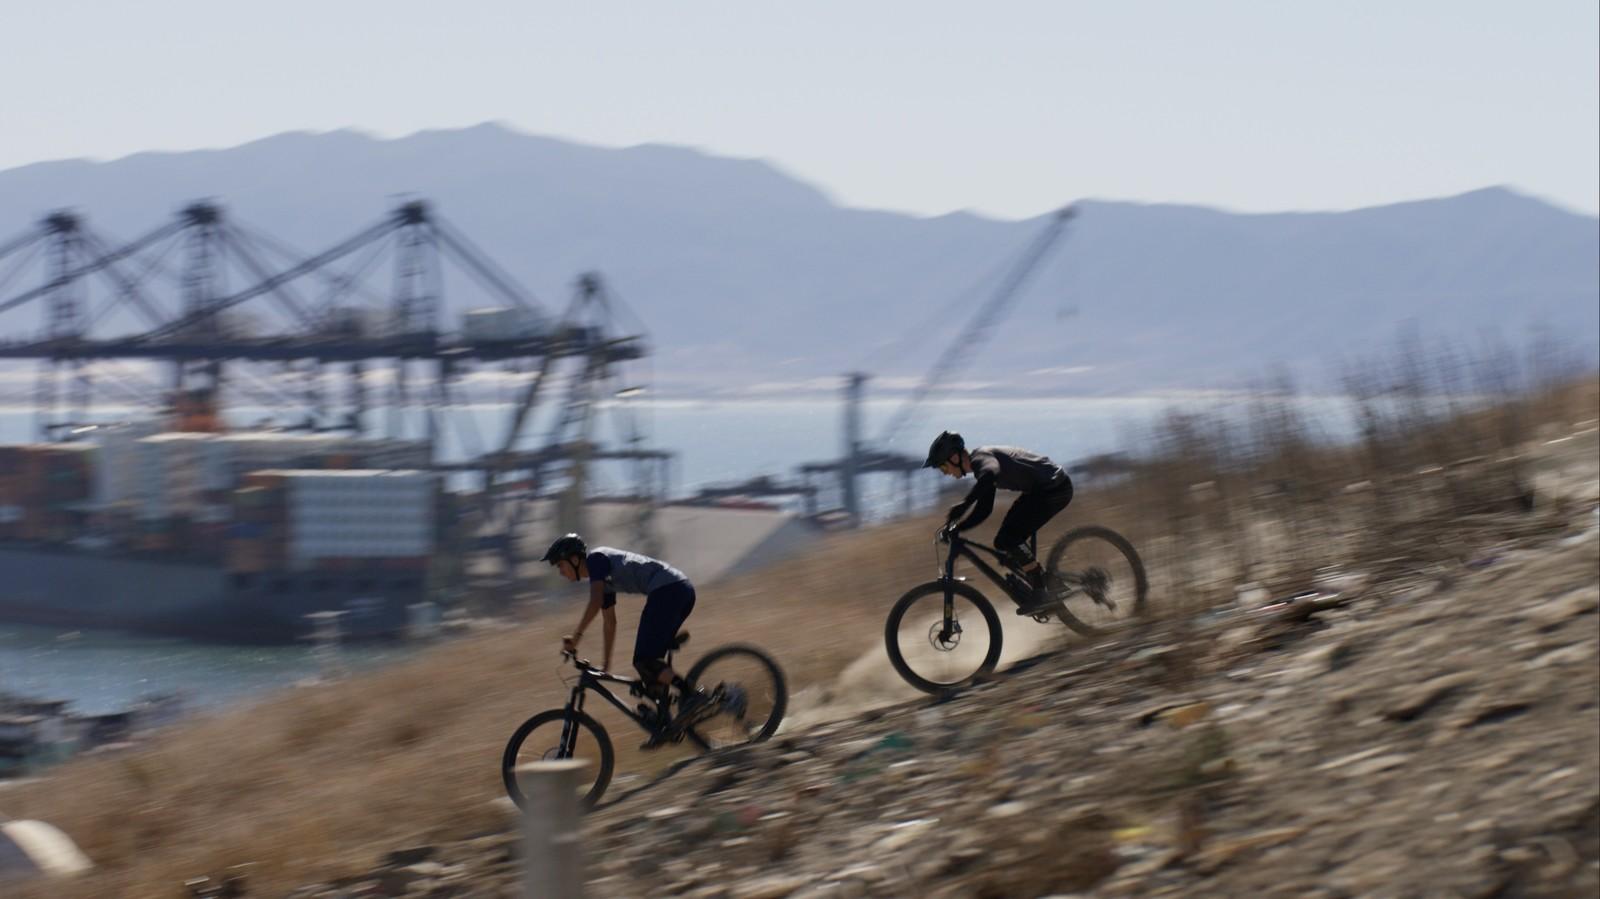 Urban Mountain Bike Riding in Ensenada, Mexico